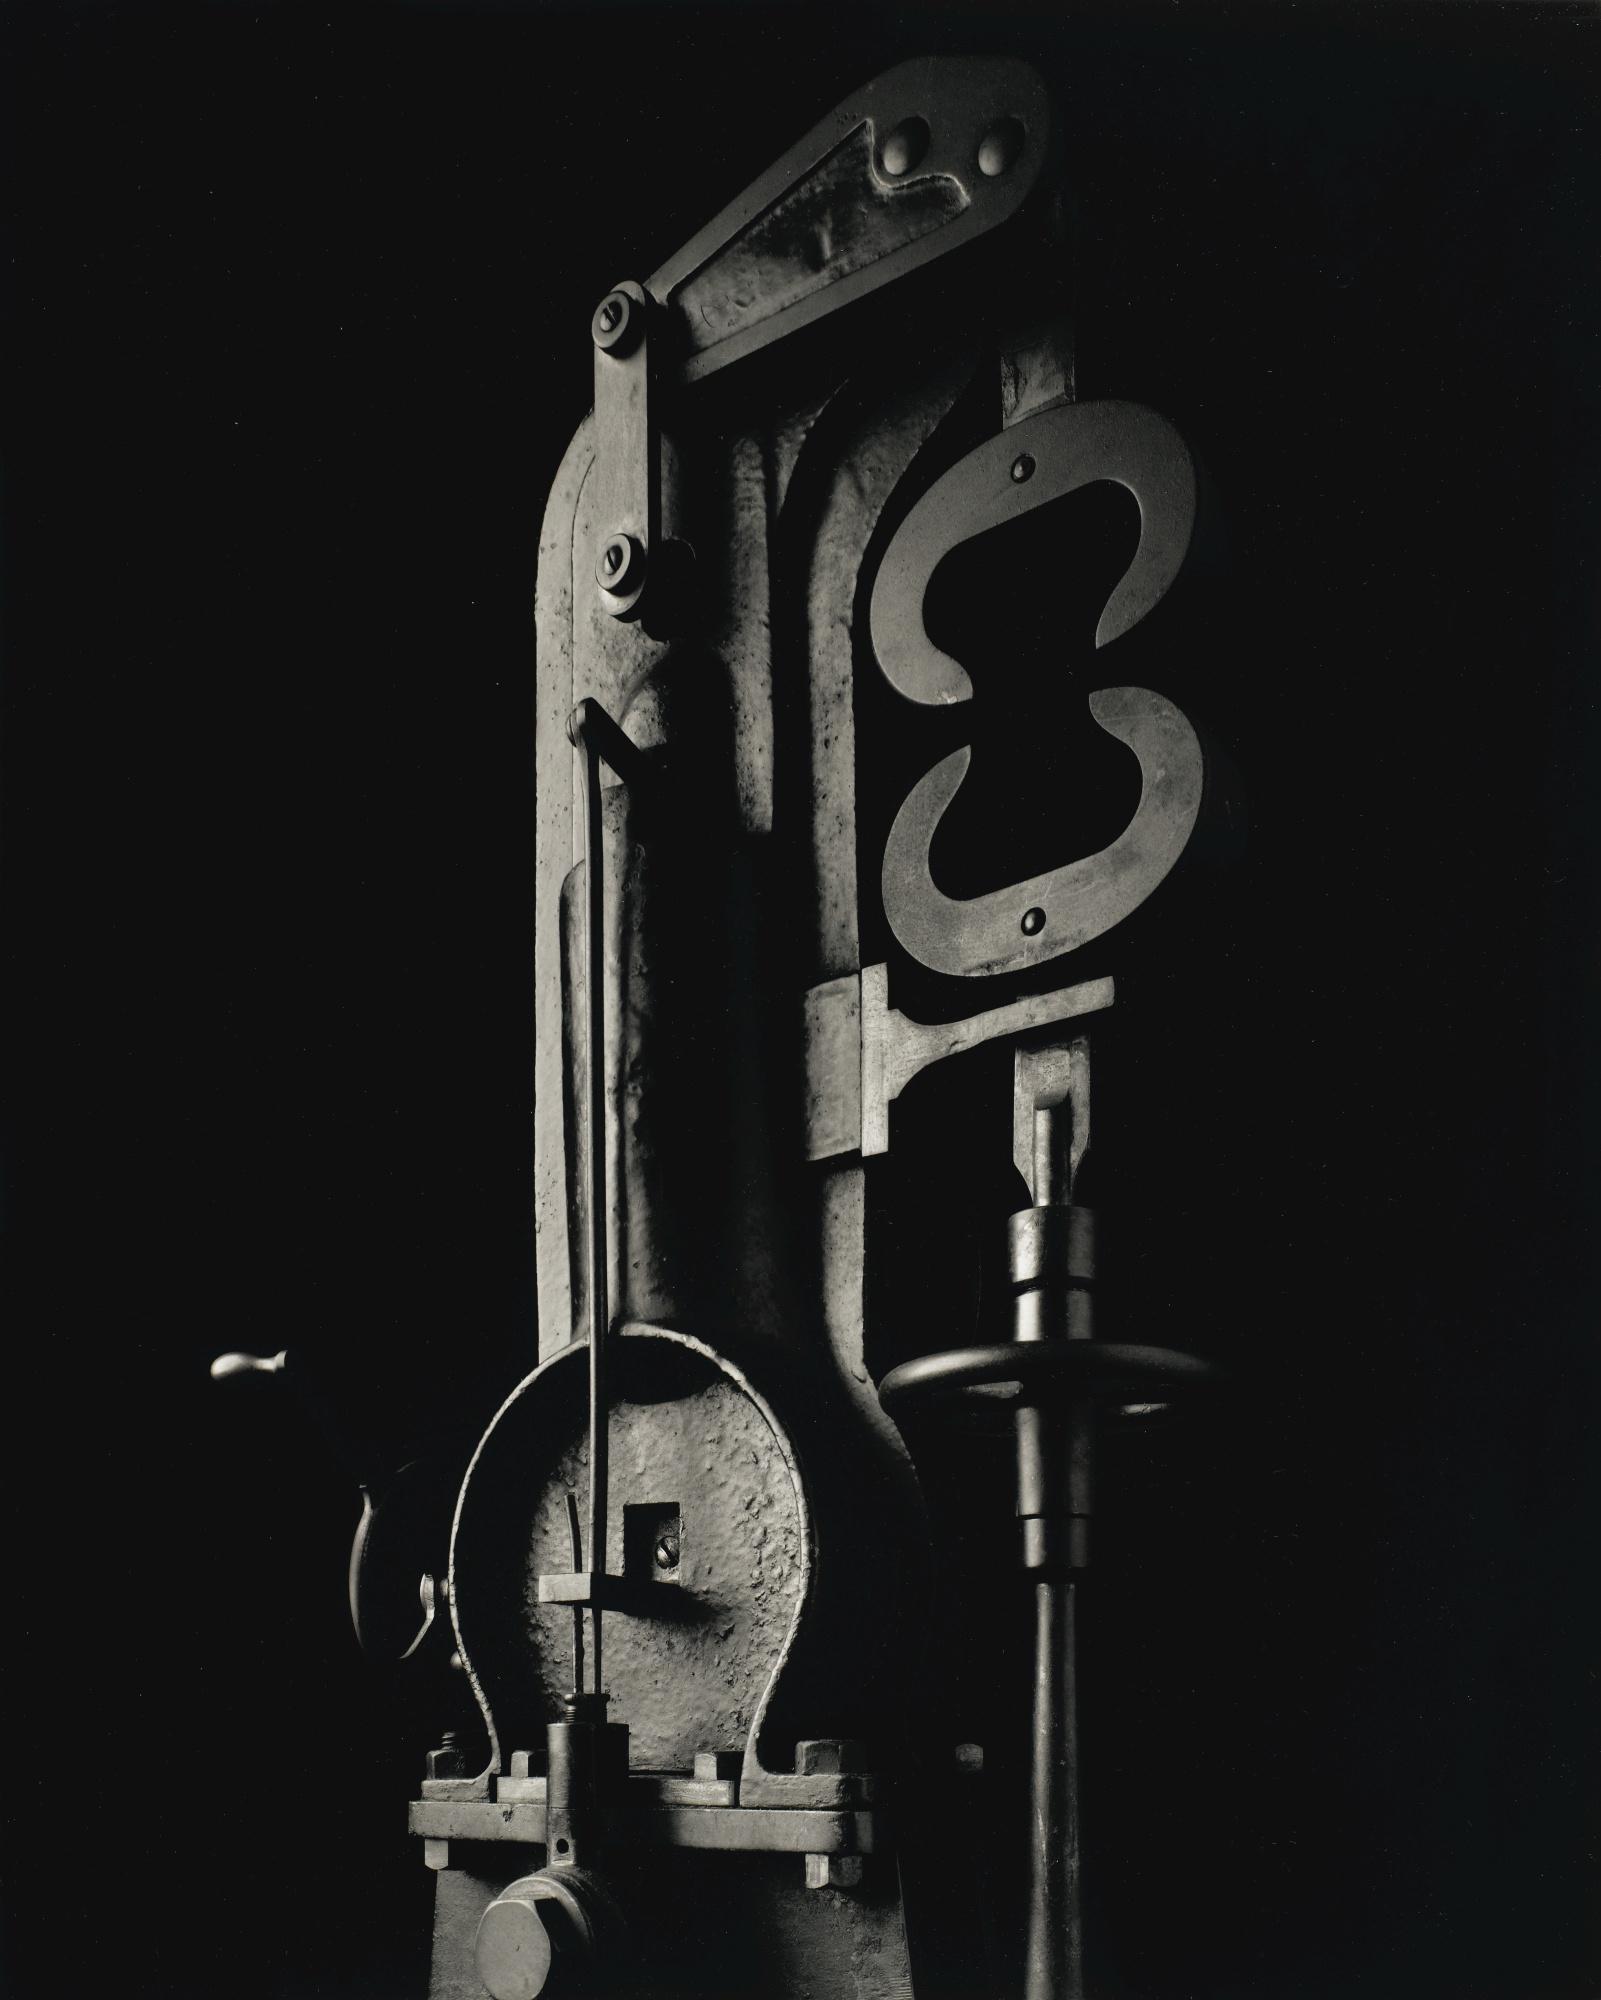 Hiroshi Sugimoto-Mechanical Form 0036 (Material Testing Machine)-2004